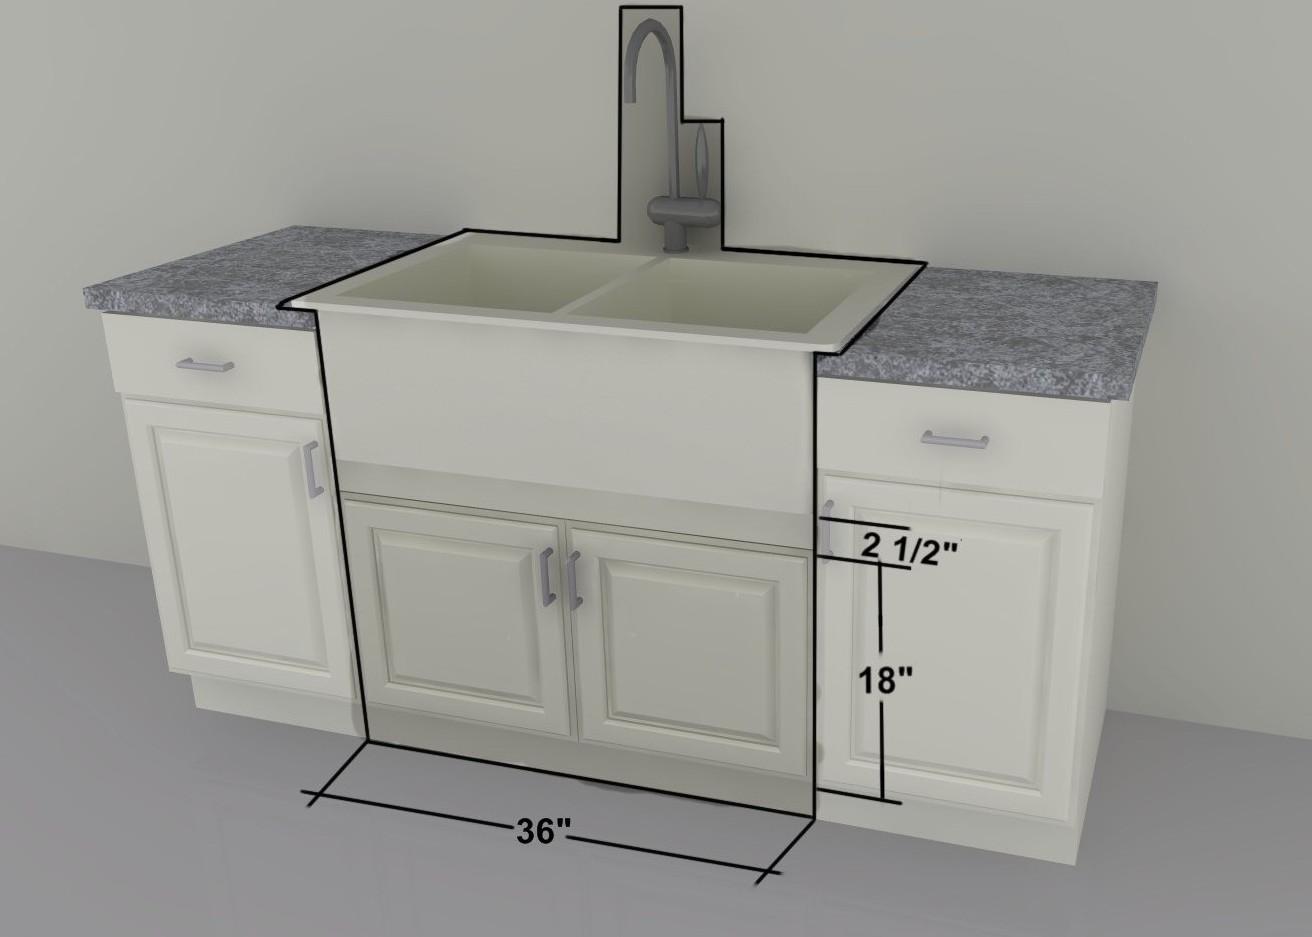 ikea custom cabinets 36 farm sink or gas cooktop units 36 kitchen sink IKEA custom cabinets 36 farm sink or gas cooktop units